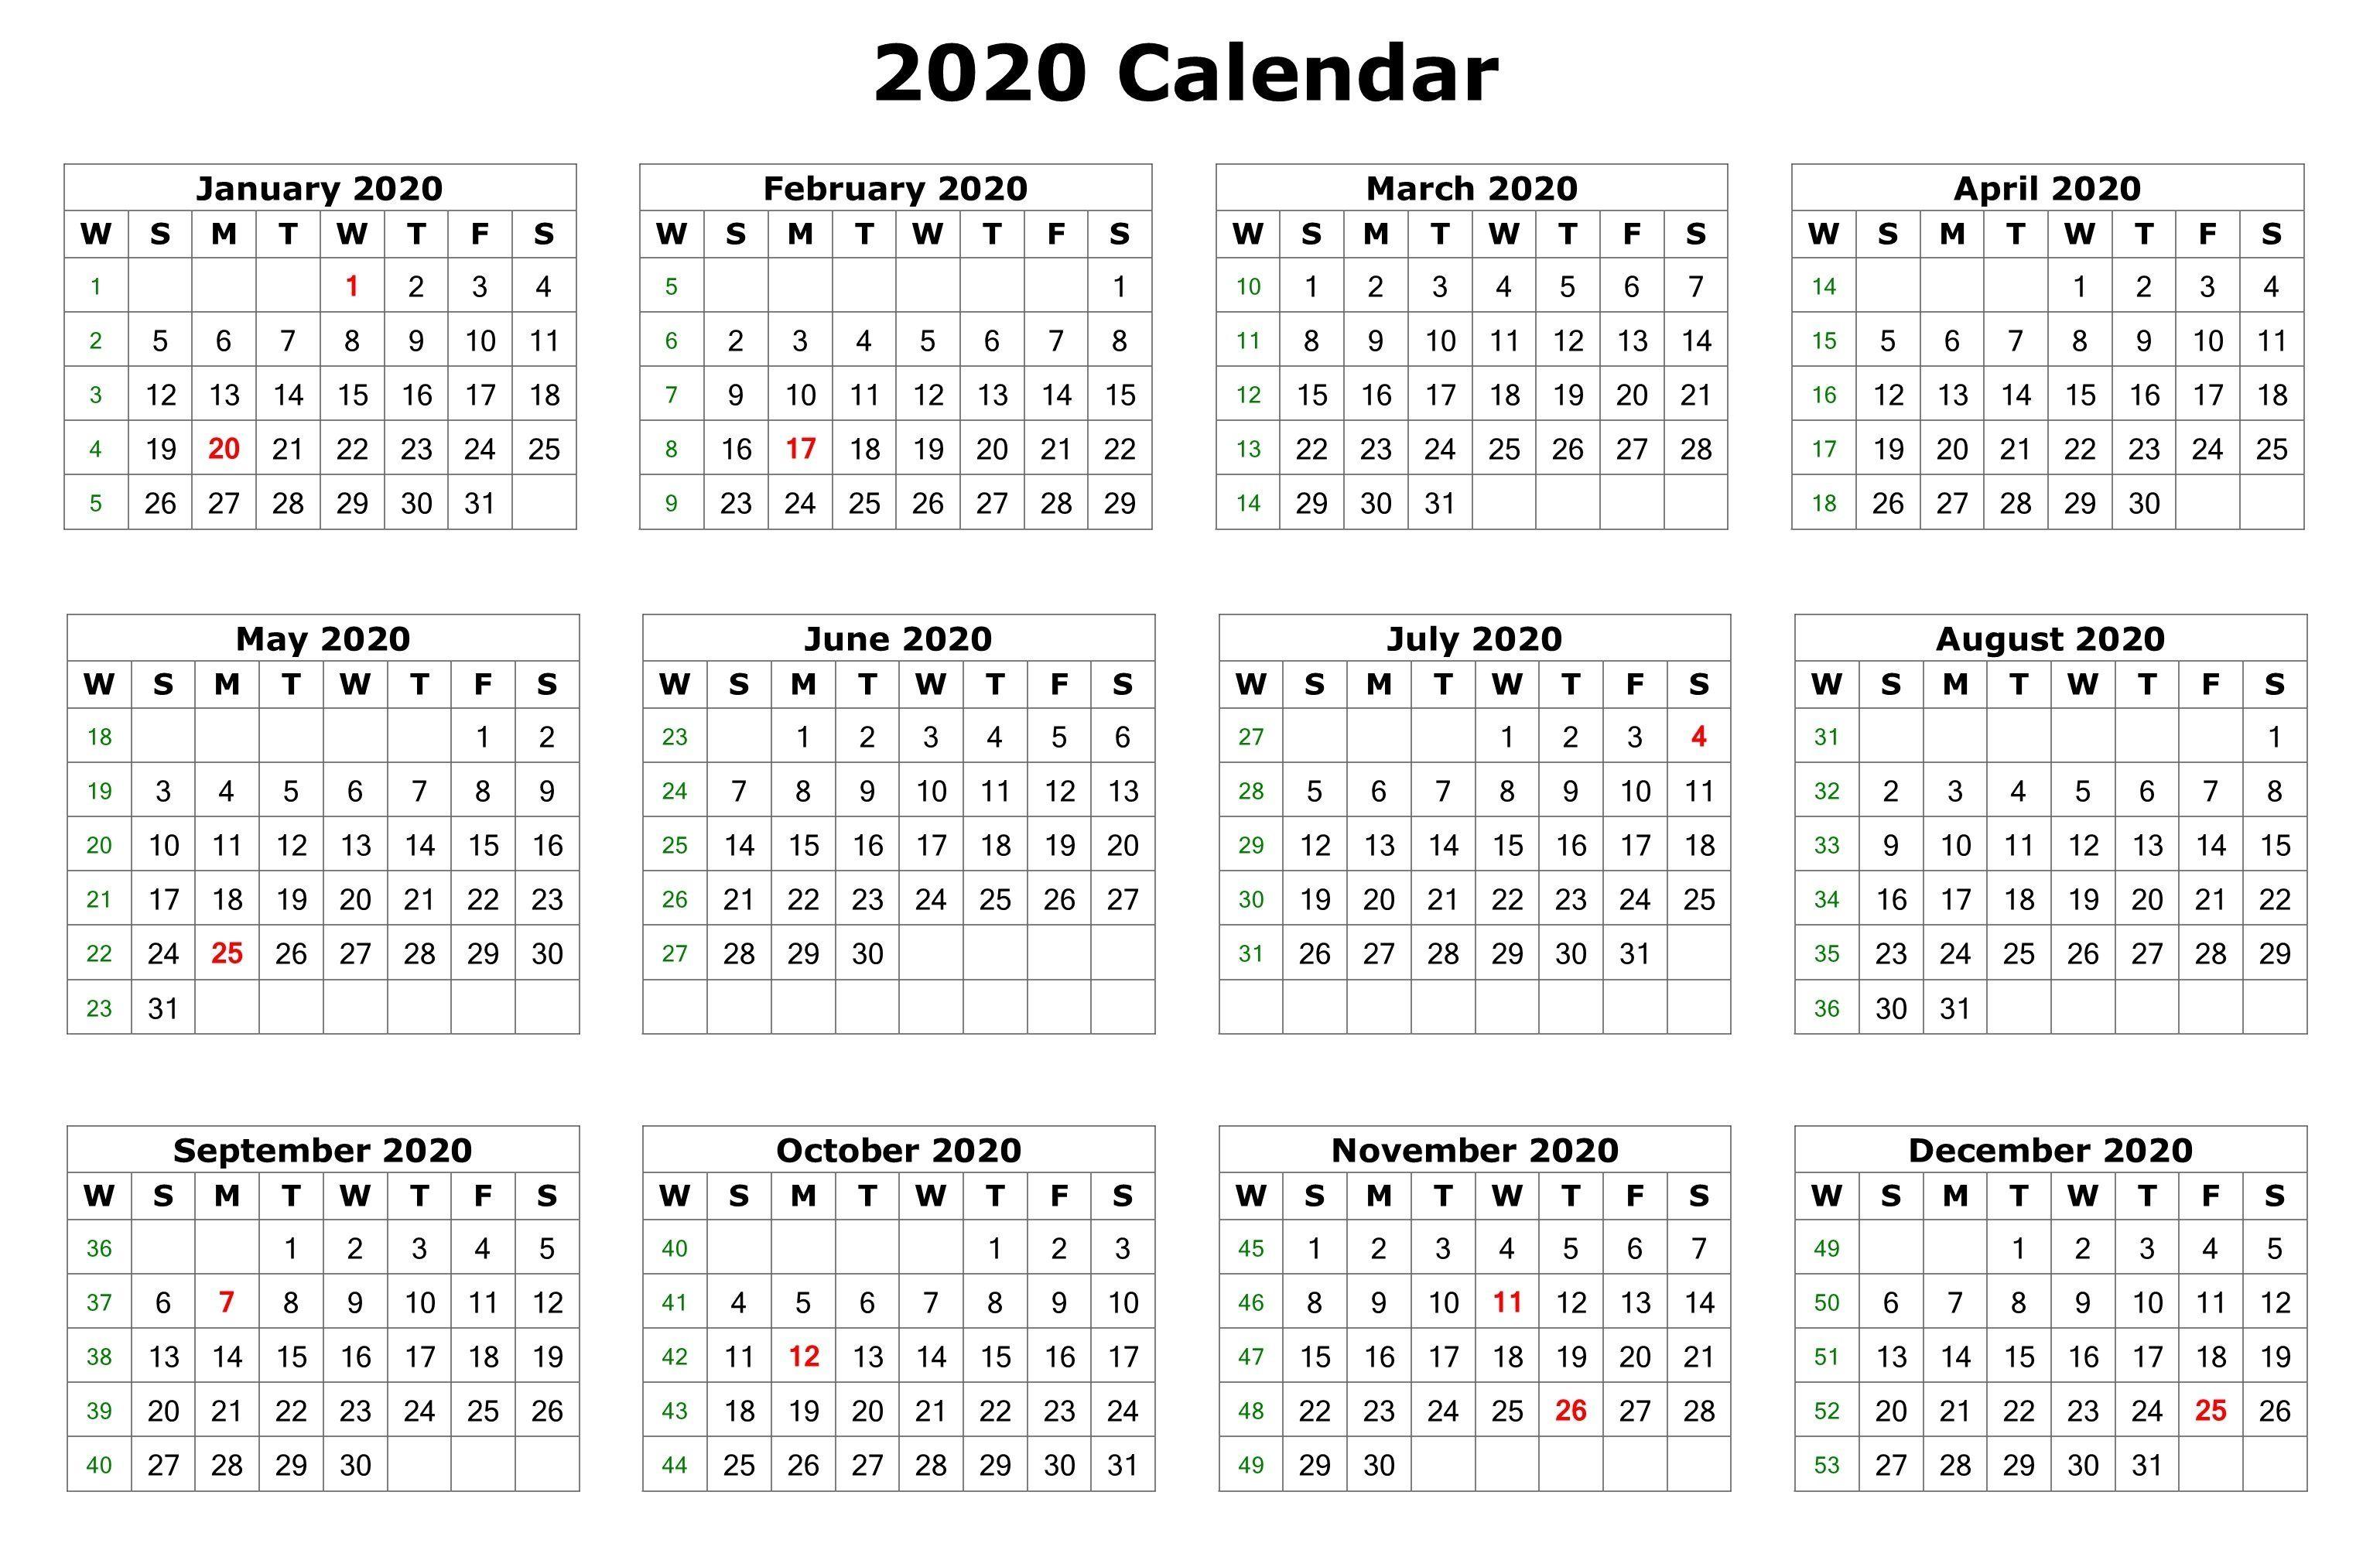 2020 12 Months Calendar Printable | 2020 Calendars